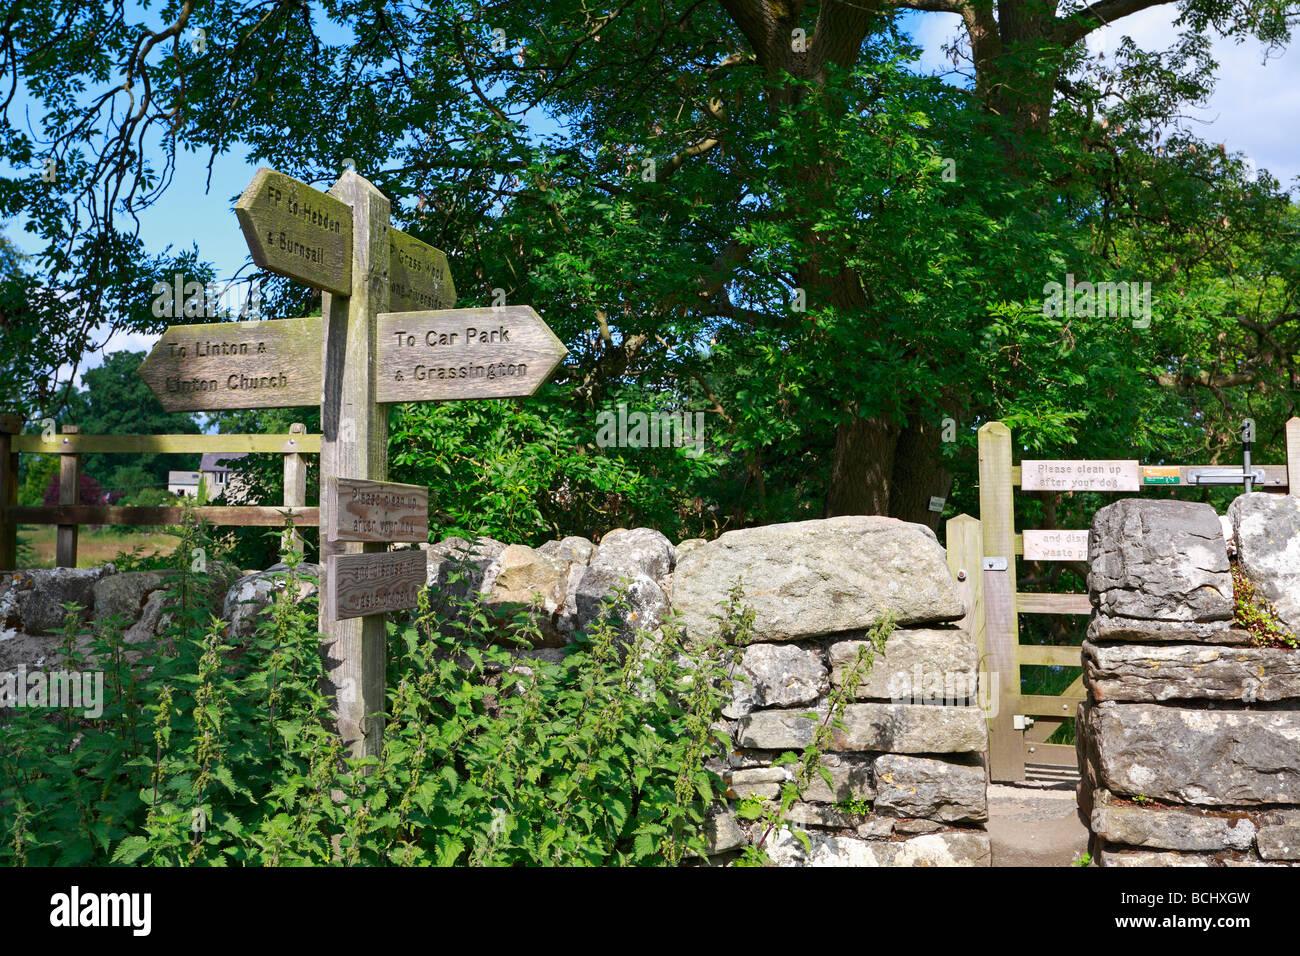 Finger-Holzpfosten Linton Grassington Yorkshire Dales National Park North Yorkshire England UK Stockbild